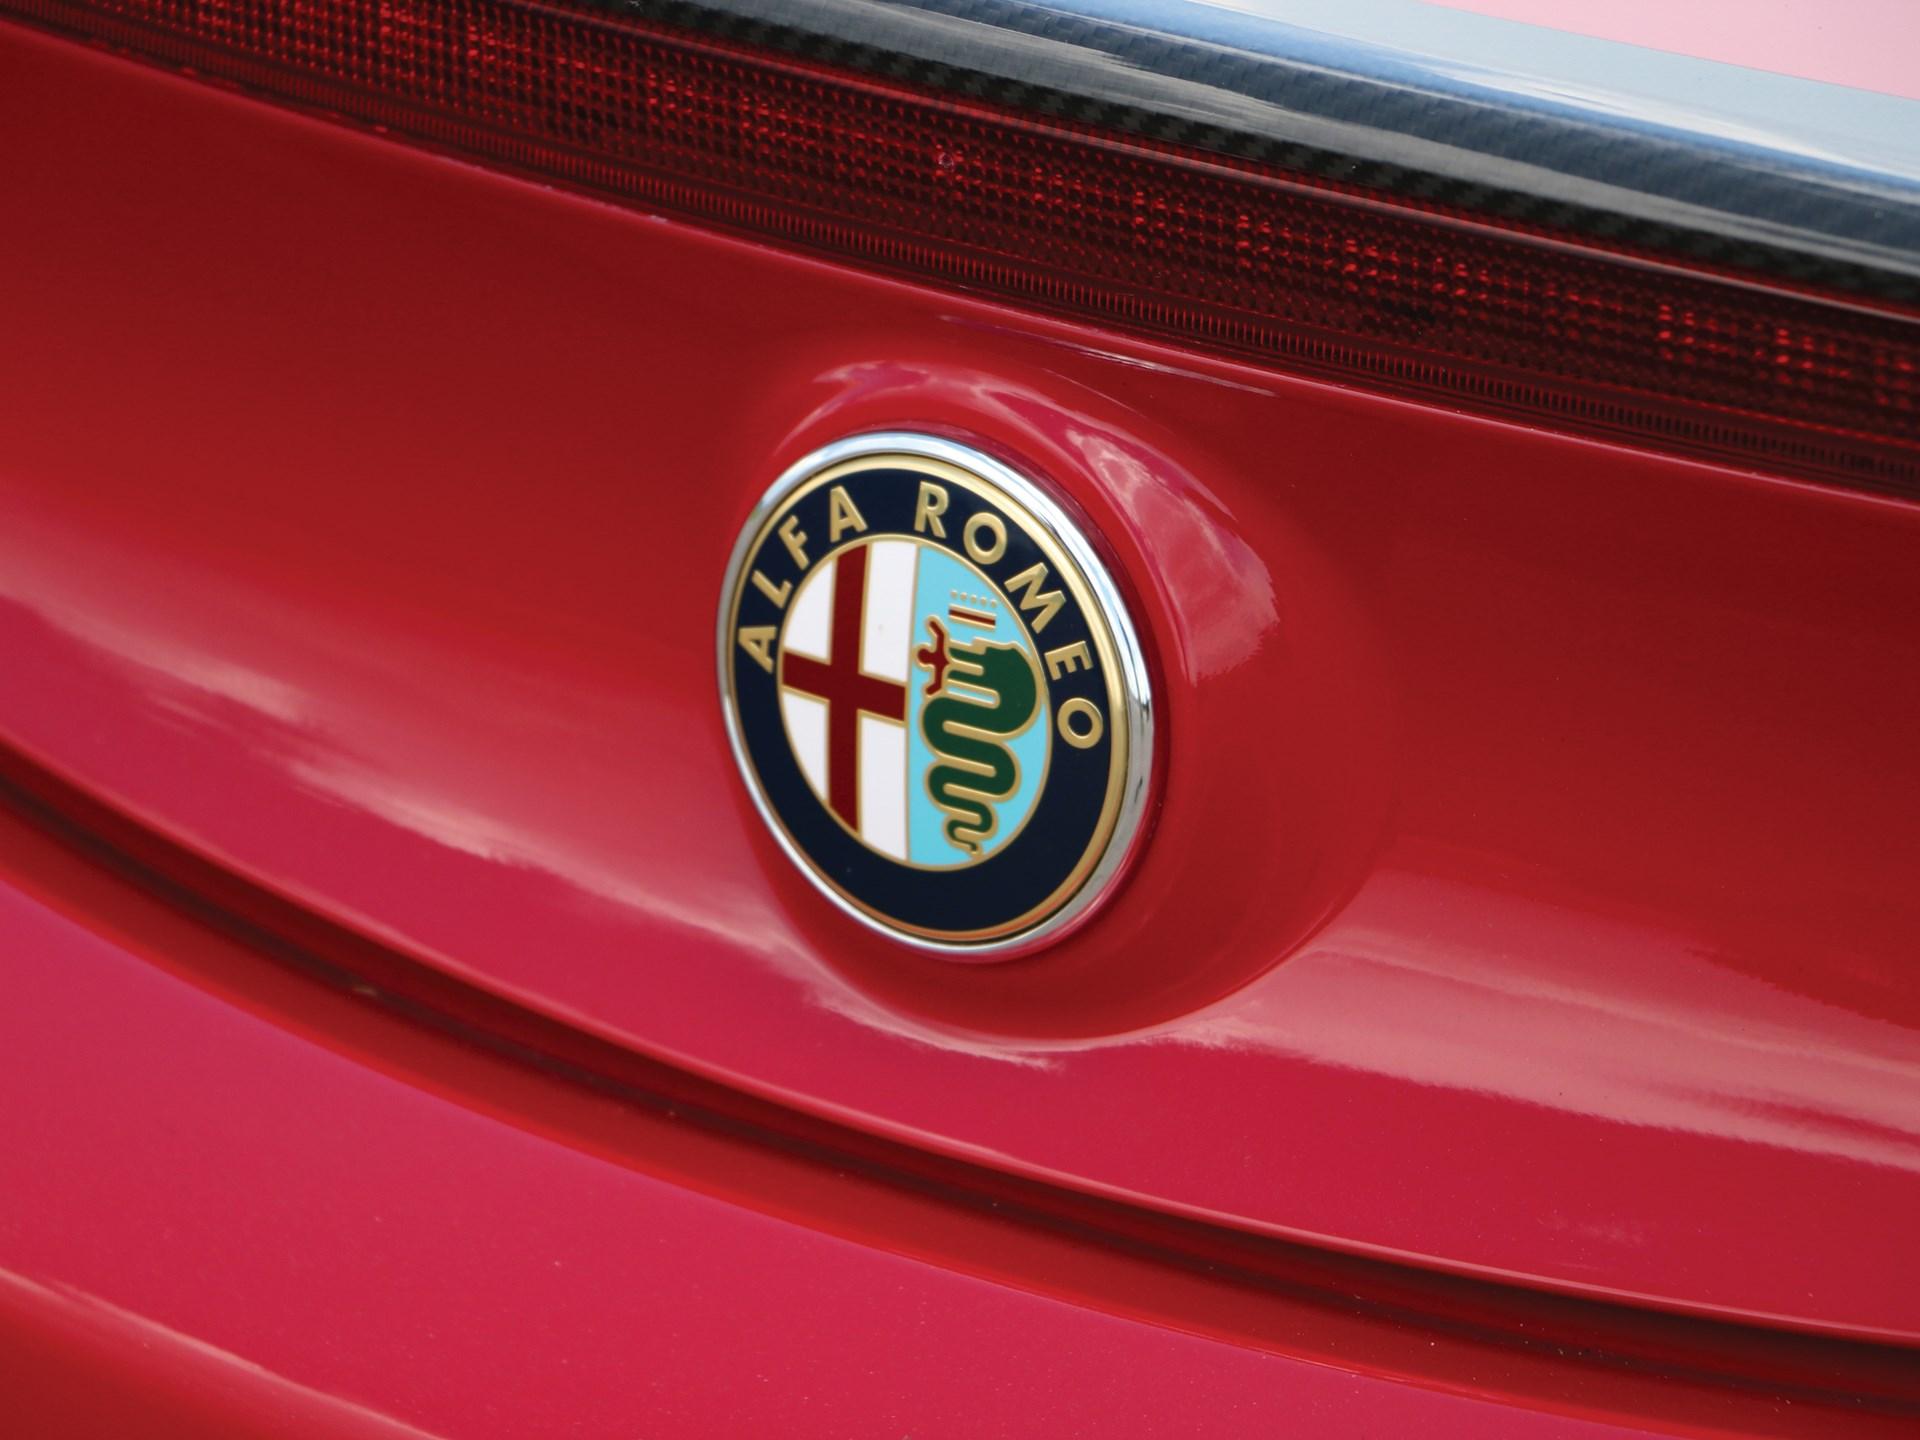 2015 Alfa Romeo 4C Launch Edition